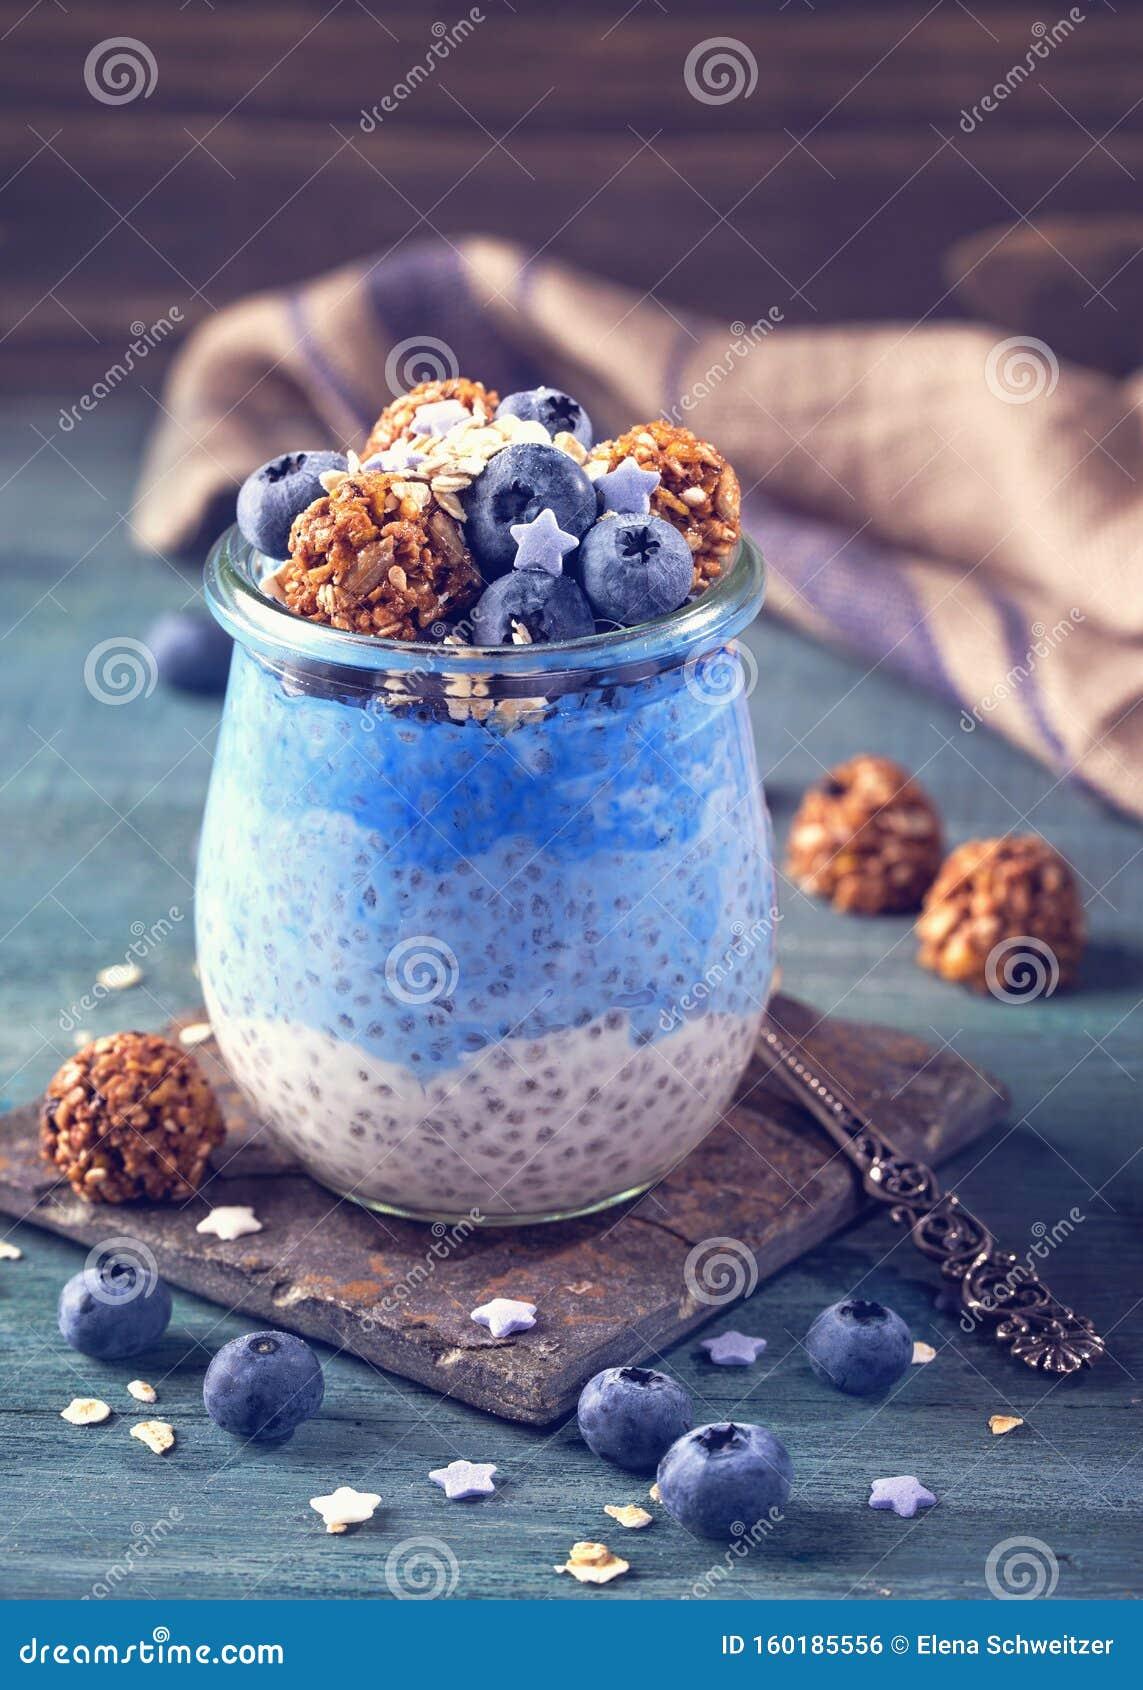 Blue spirulina pudding